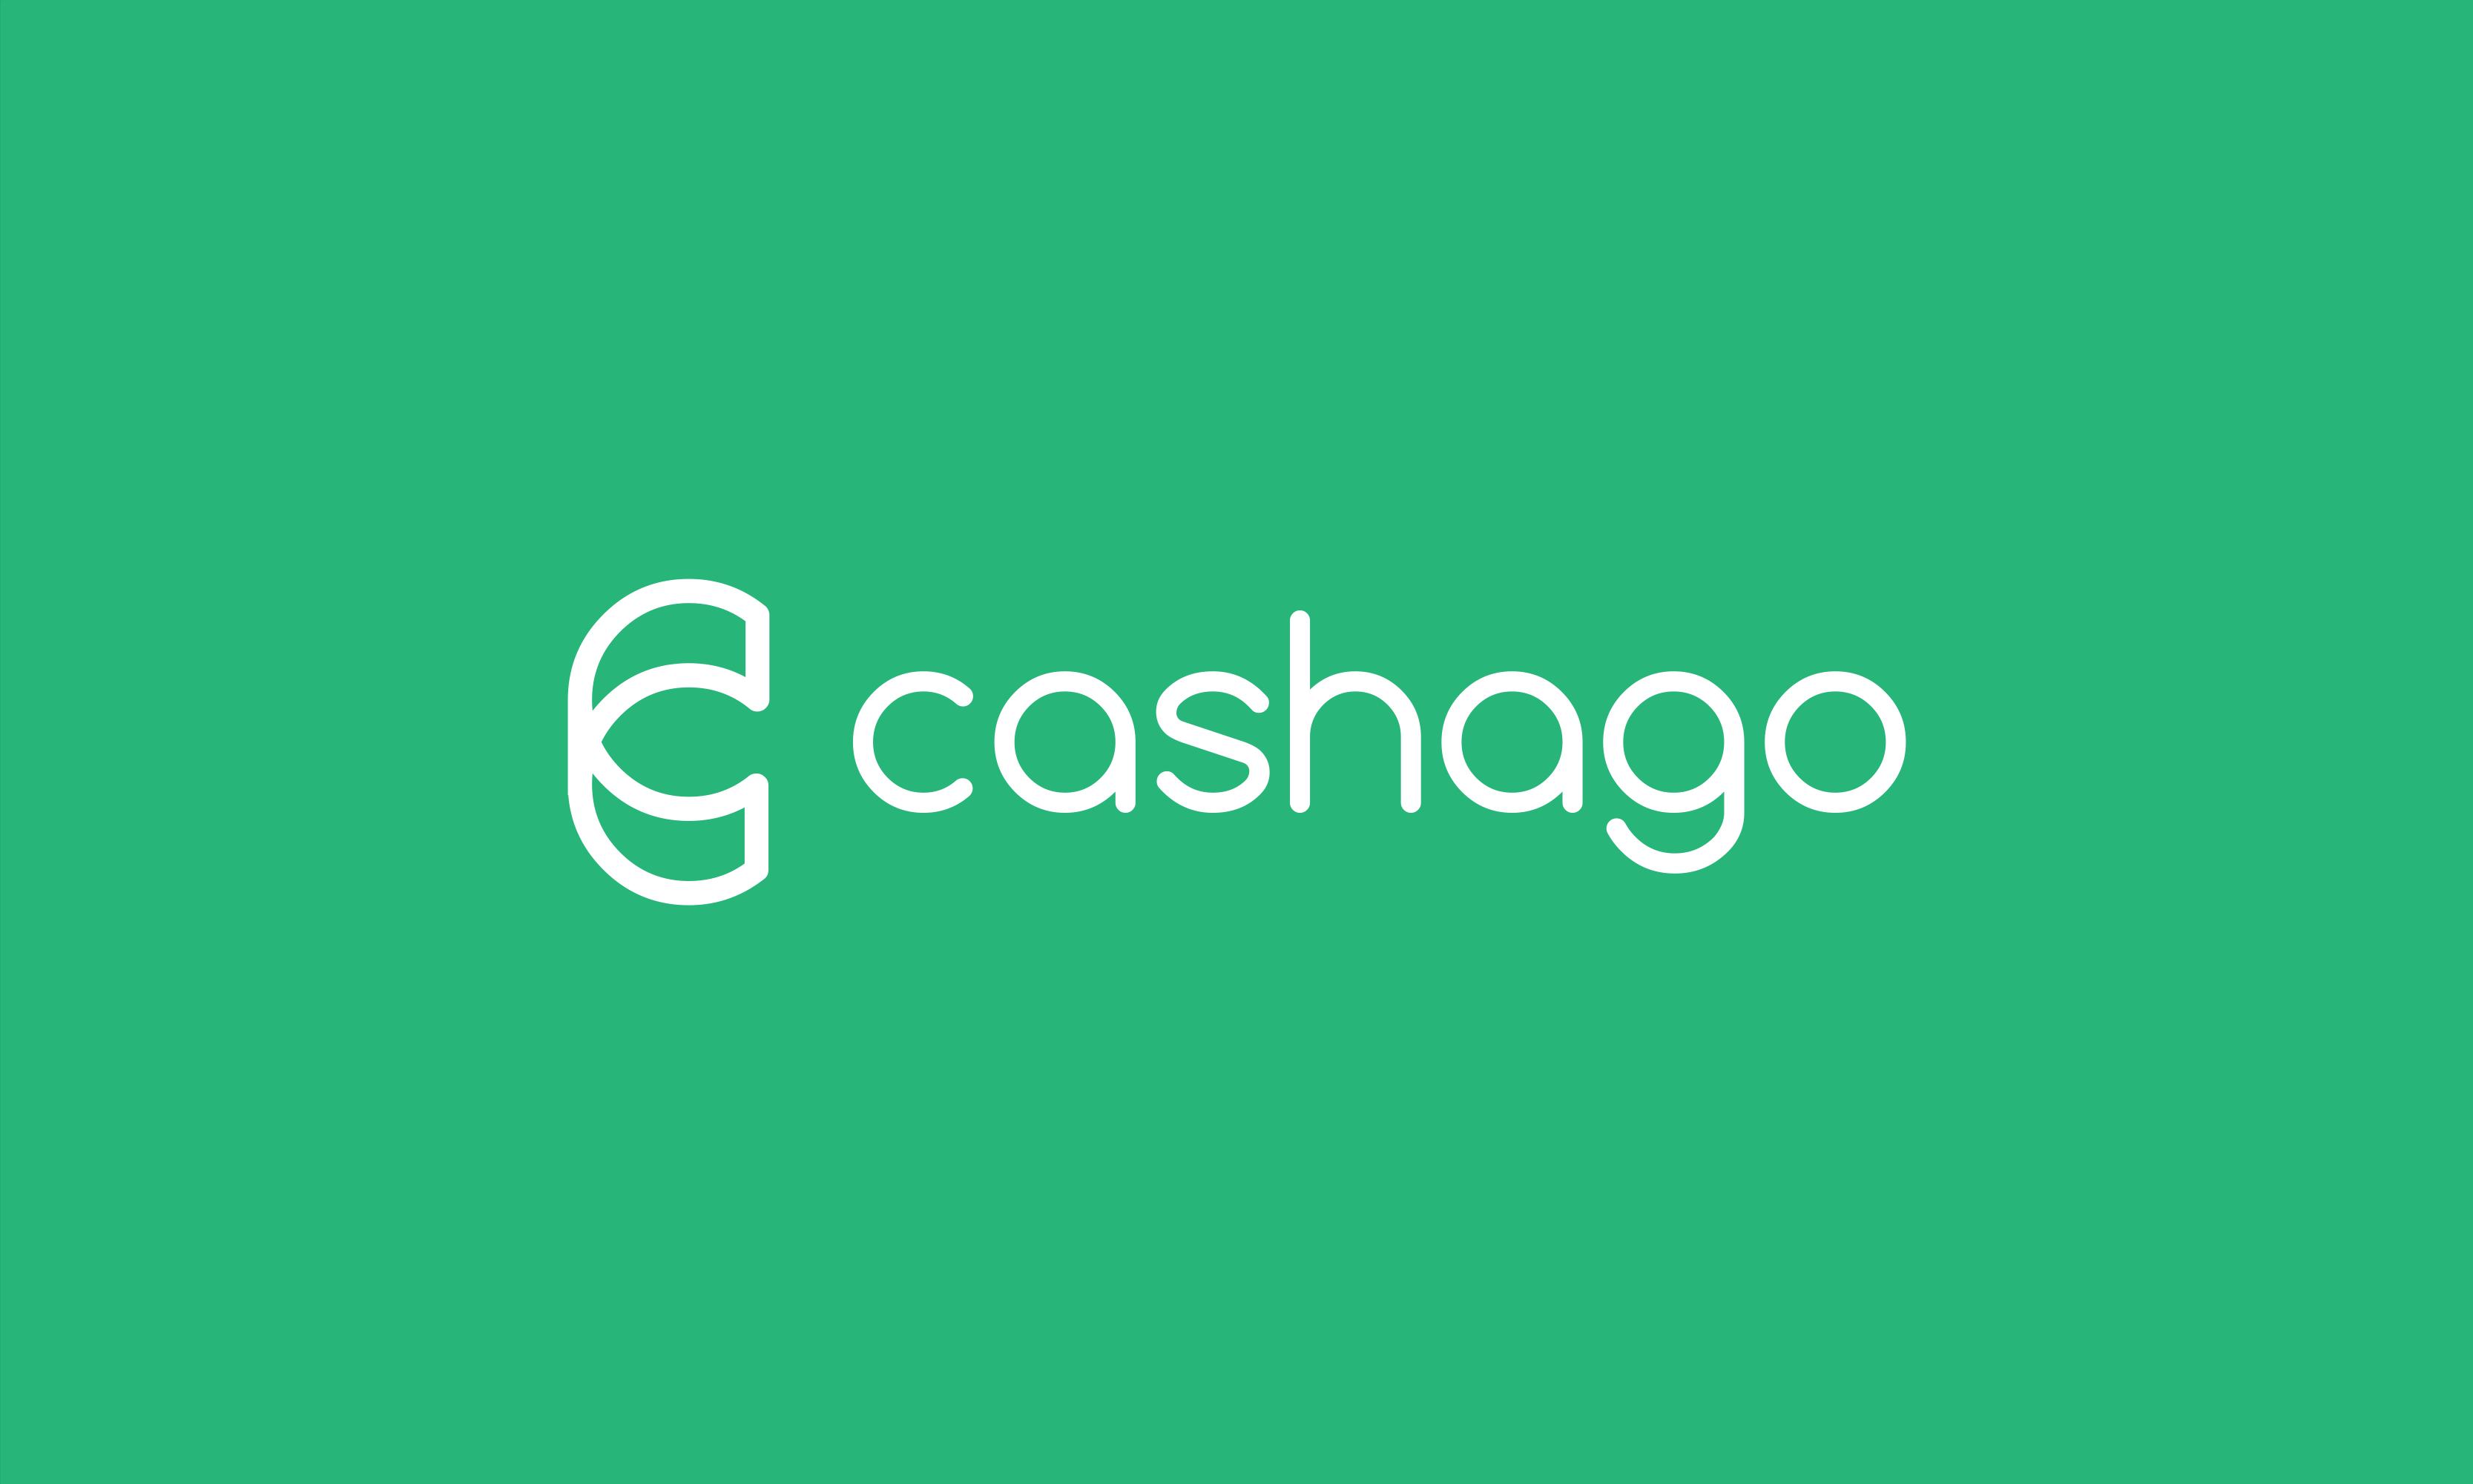 cashago logo